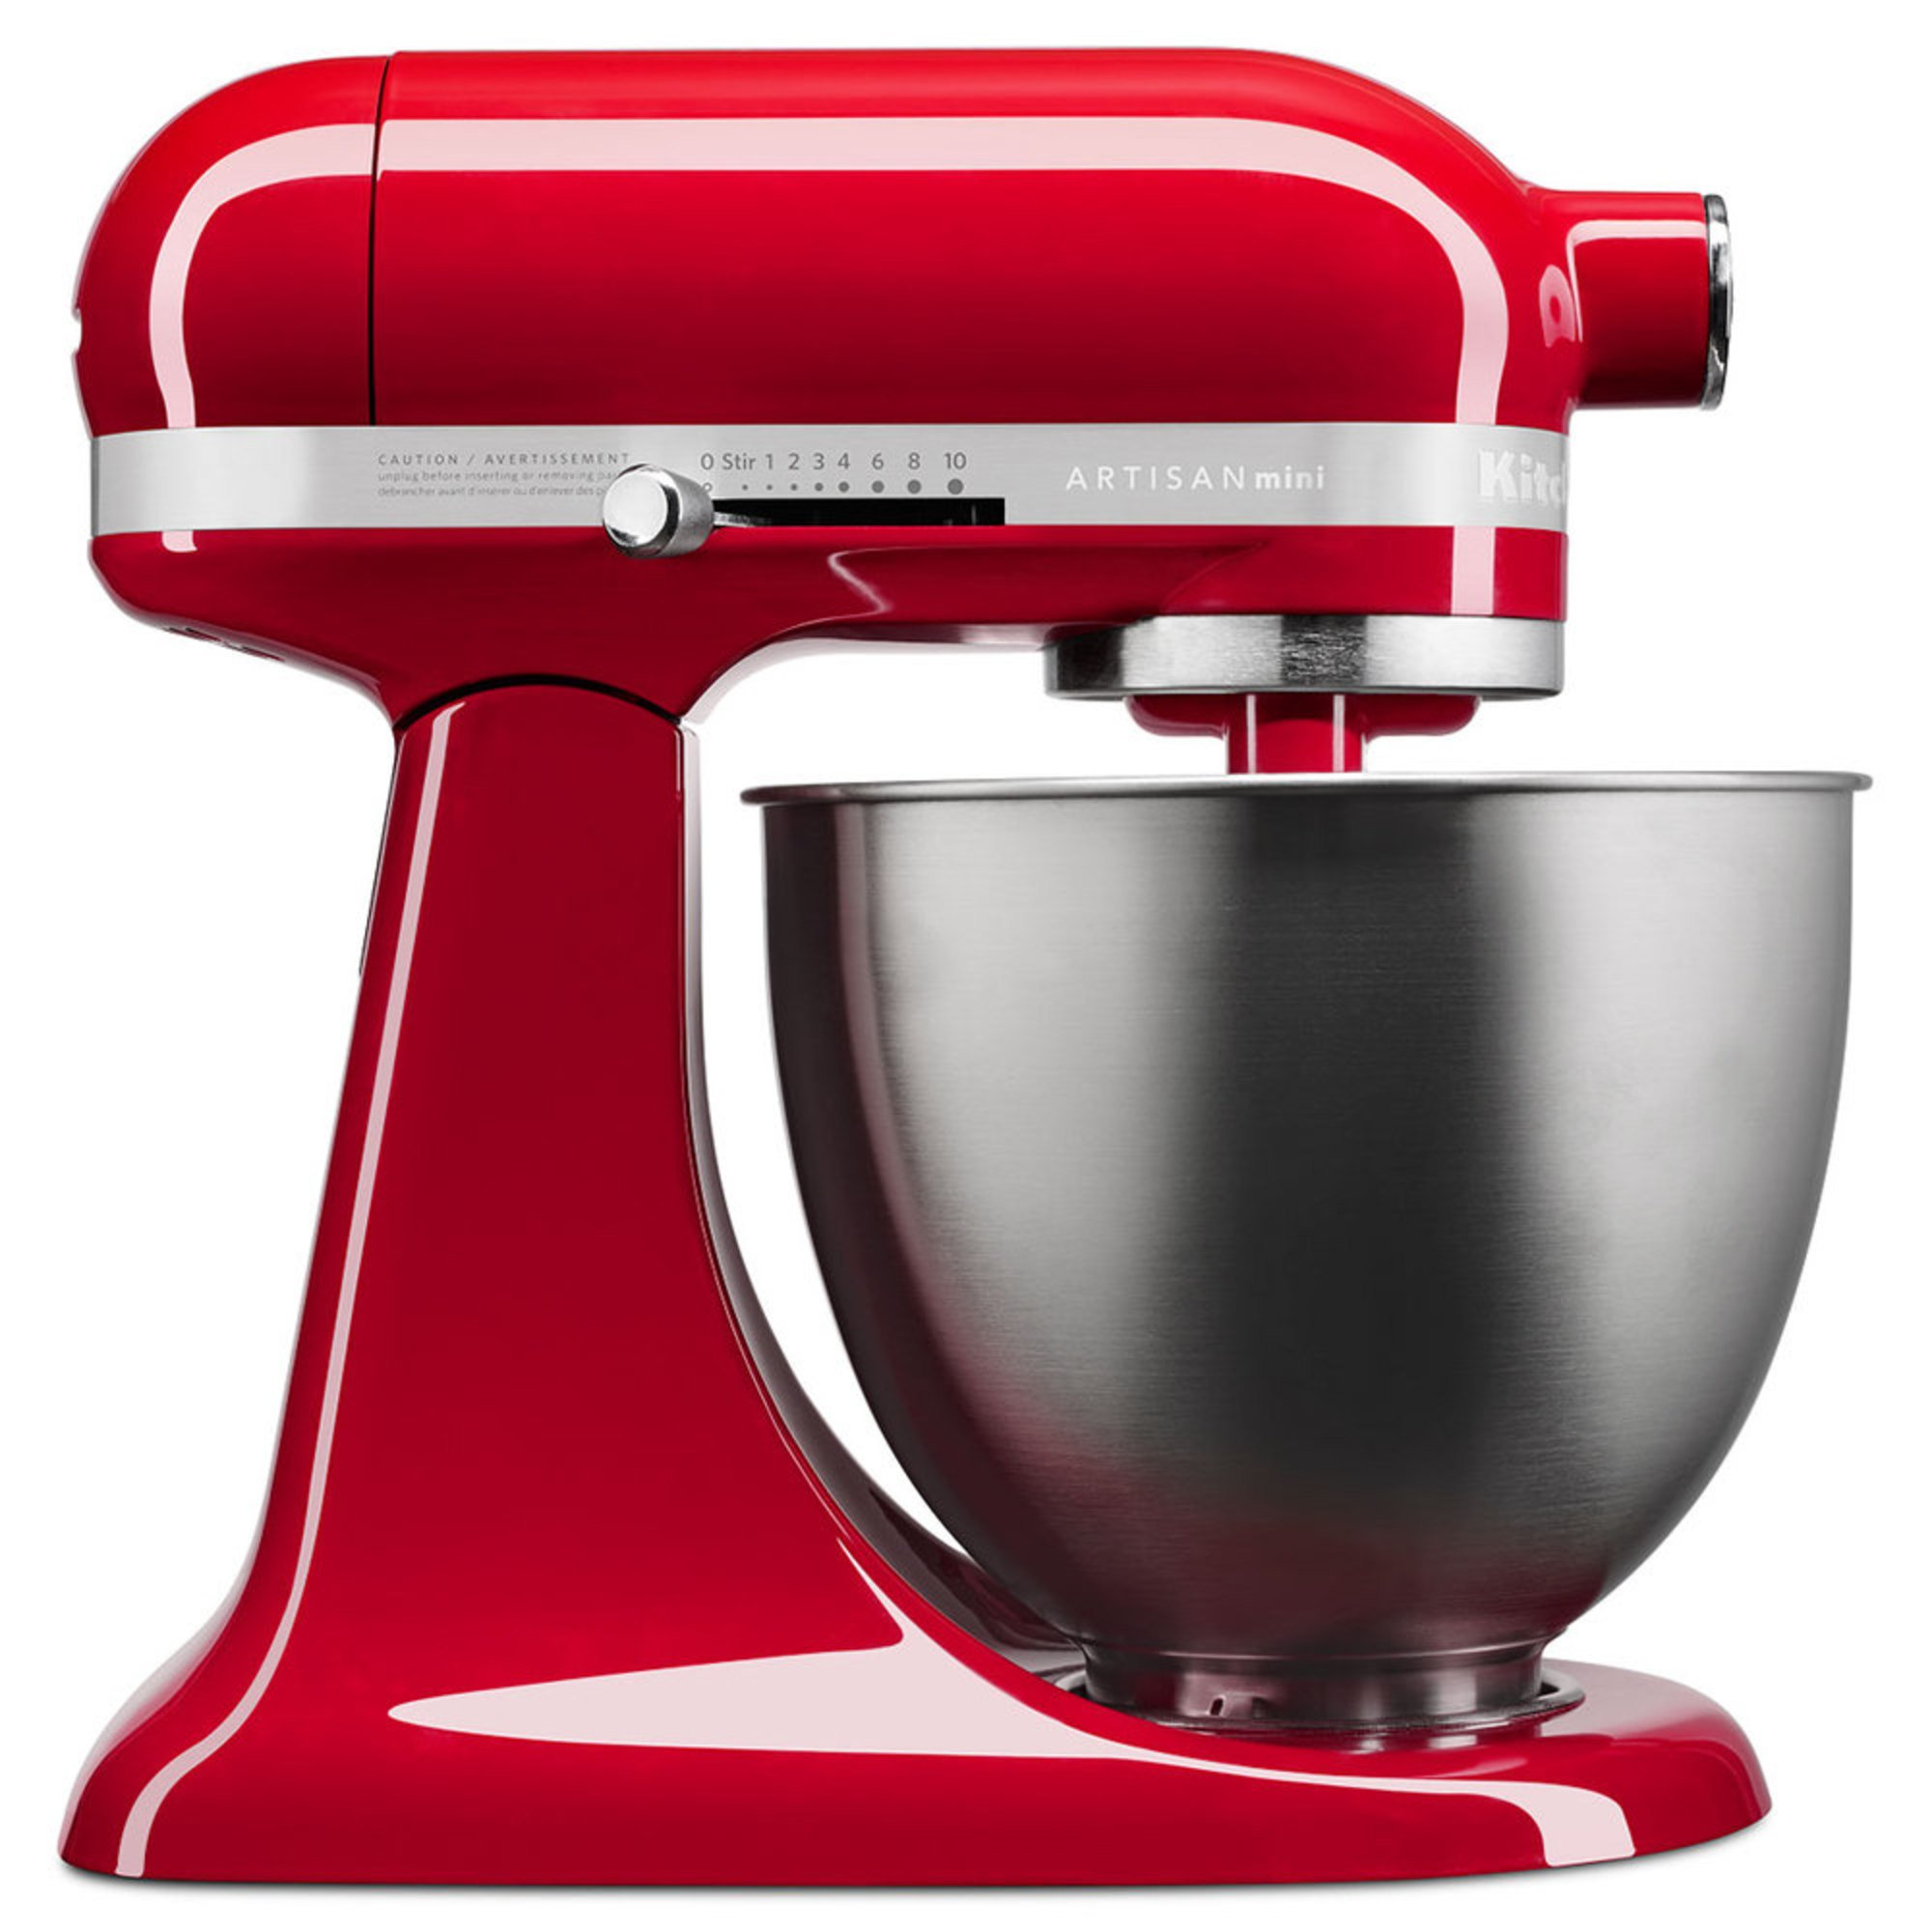 Kitchenaid artisan mini 3 5 quart stand mixer empire red ksm3311xer stand mixers for the - Kitchenaid artisan qt stand mixer sale ...